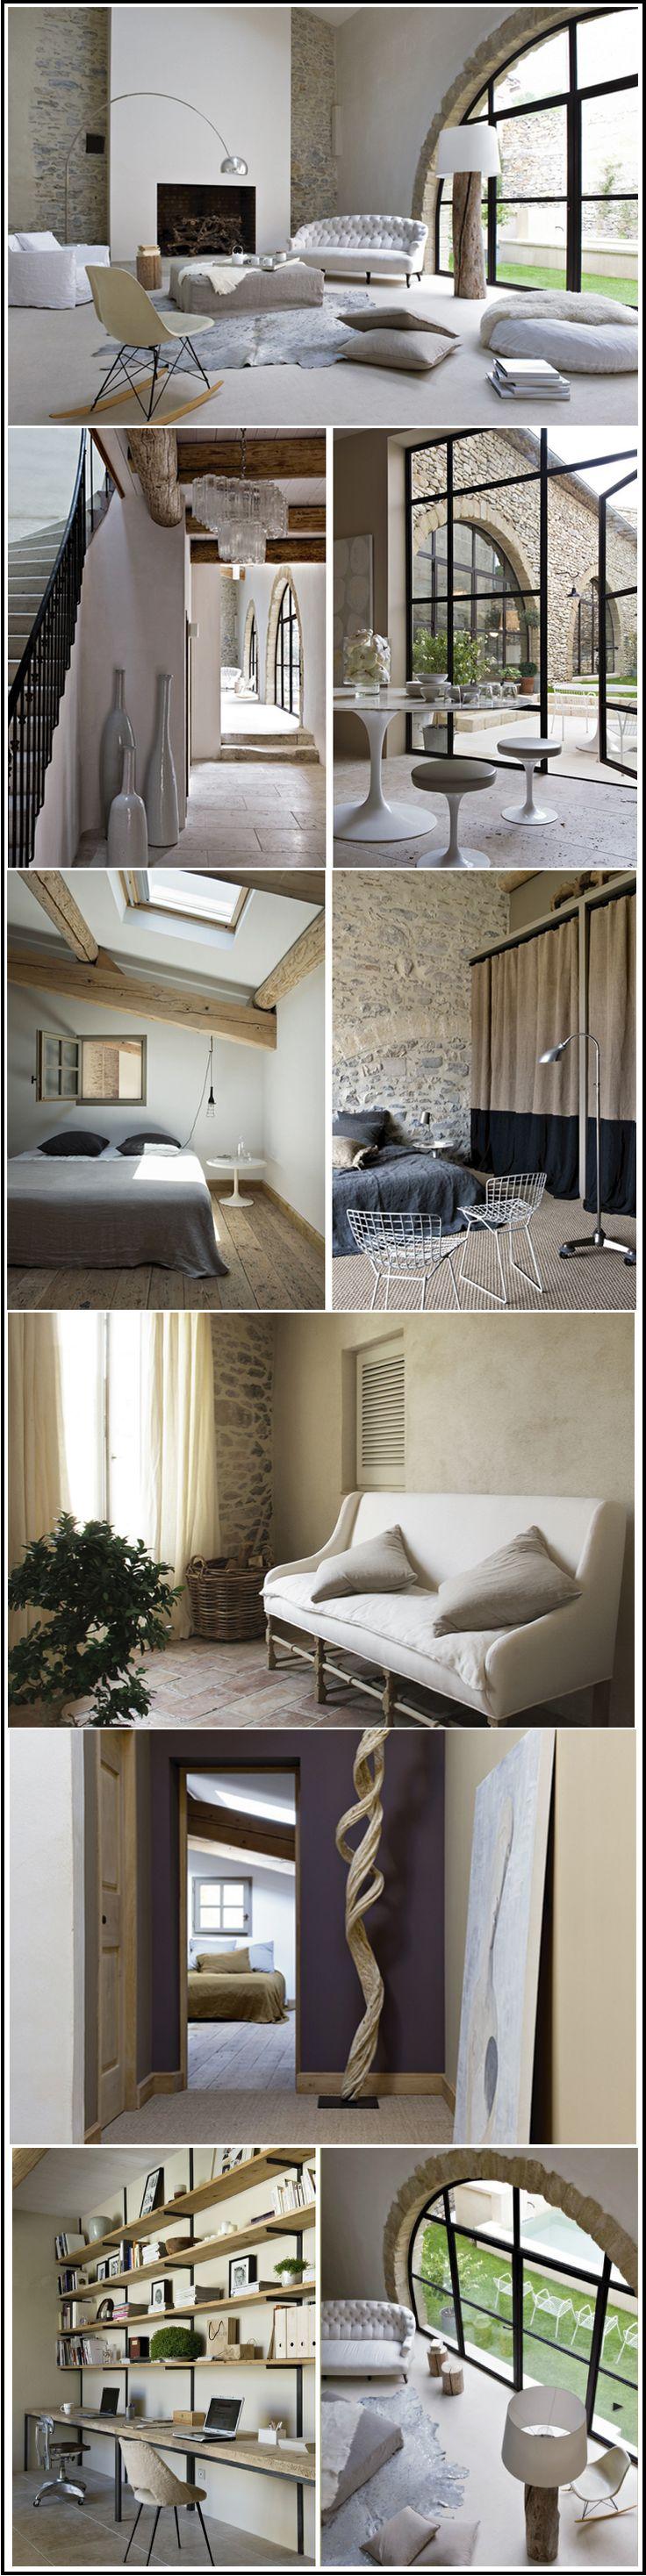 marie laure helmkampf renovation   www.chiara-stella-home.com